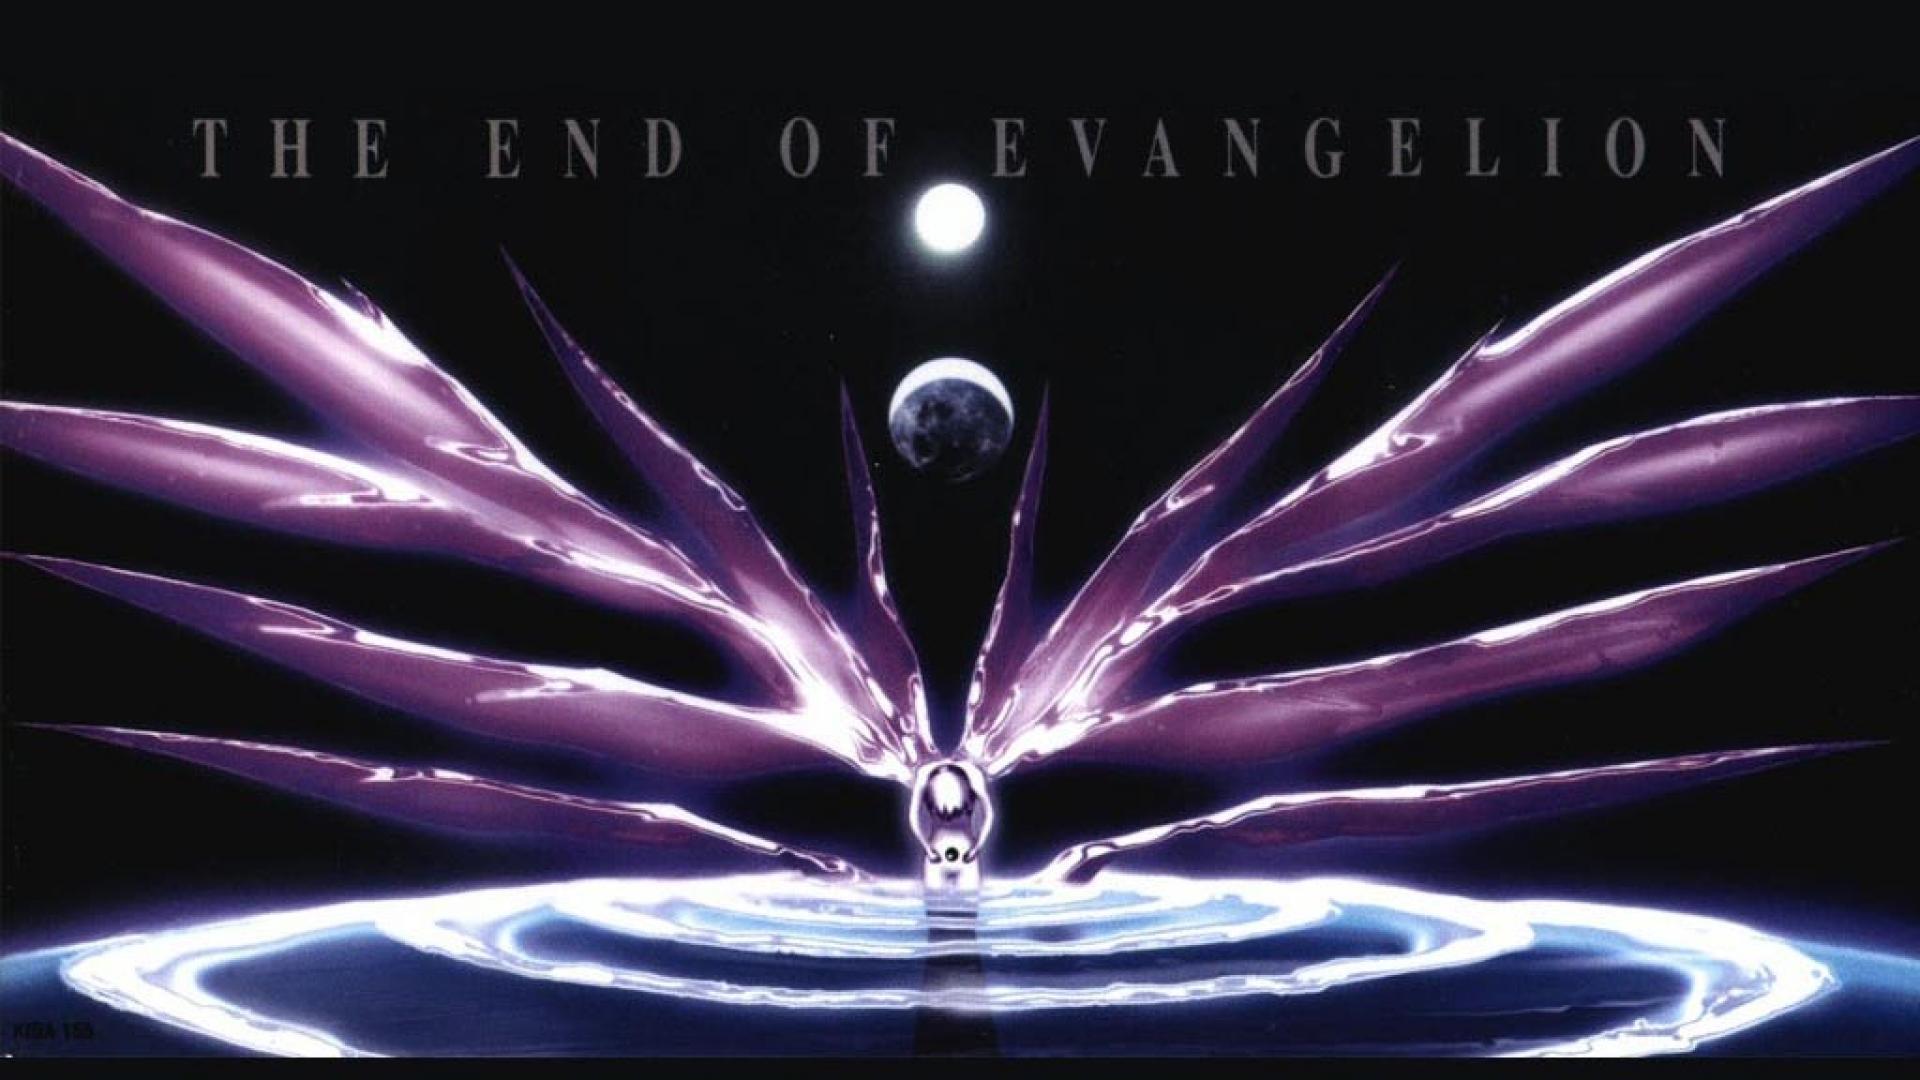 Neon Genesis Evangelion 1920x1080 Hd Wallpaper 1272684